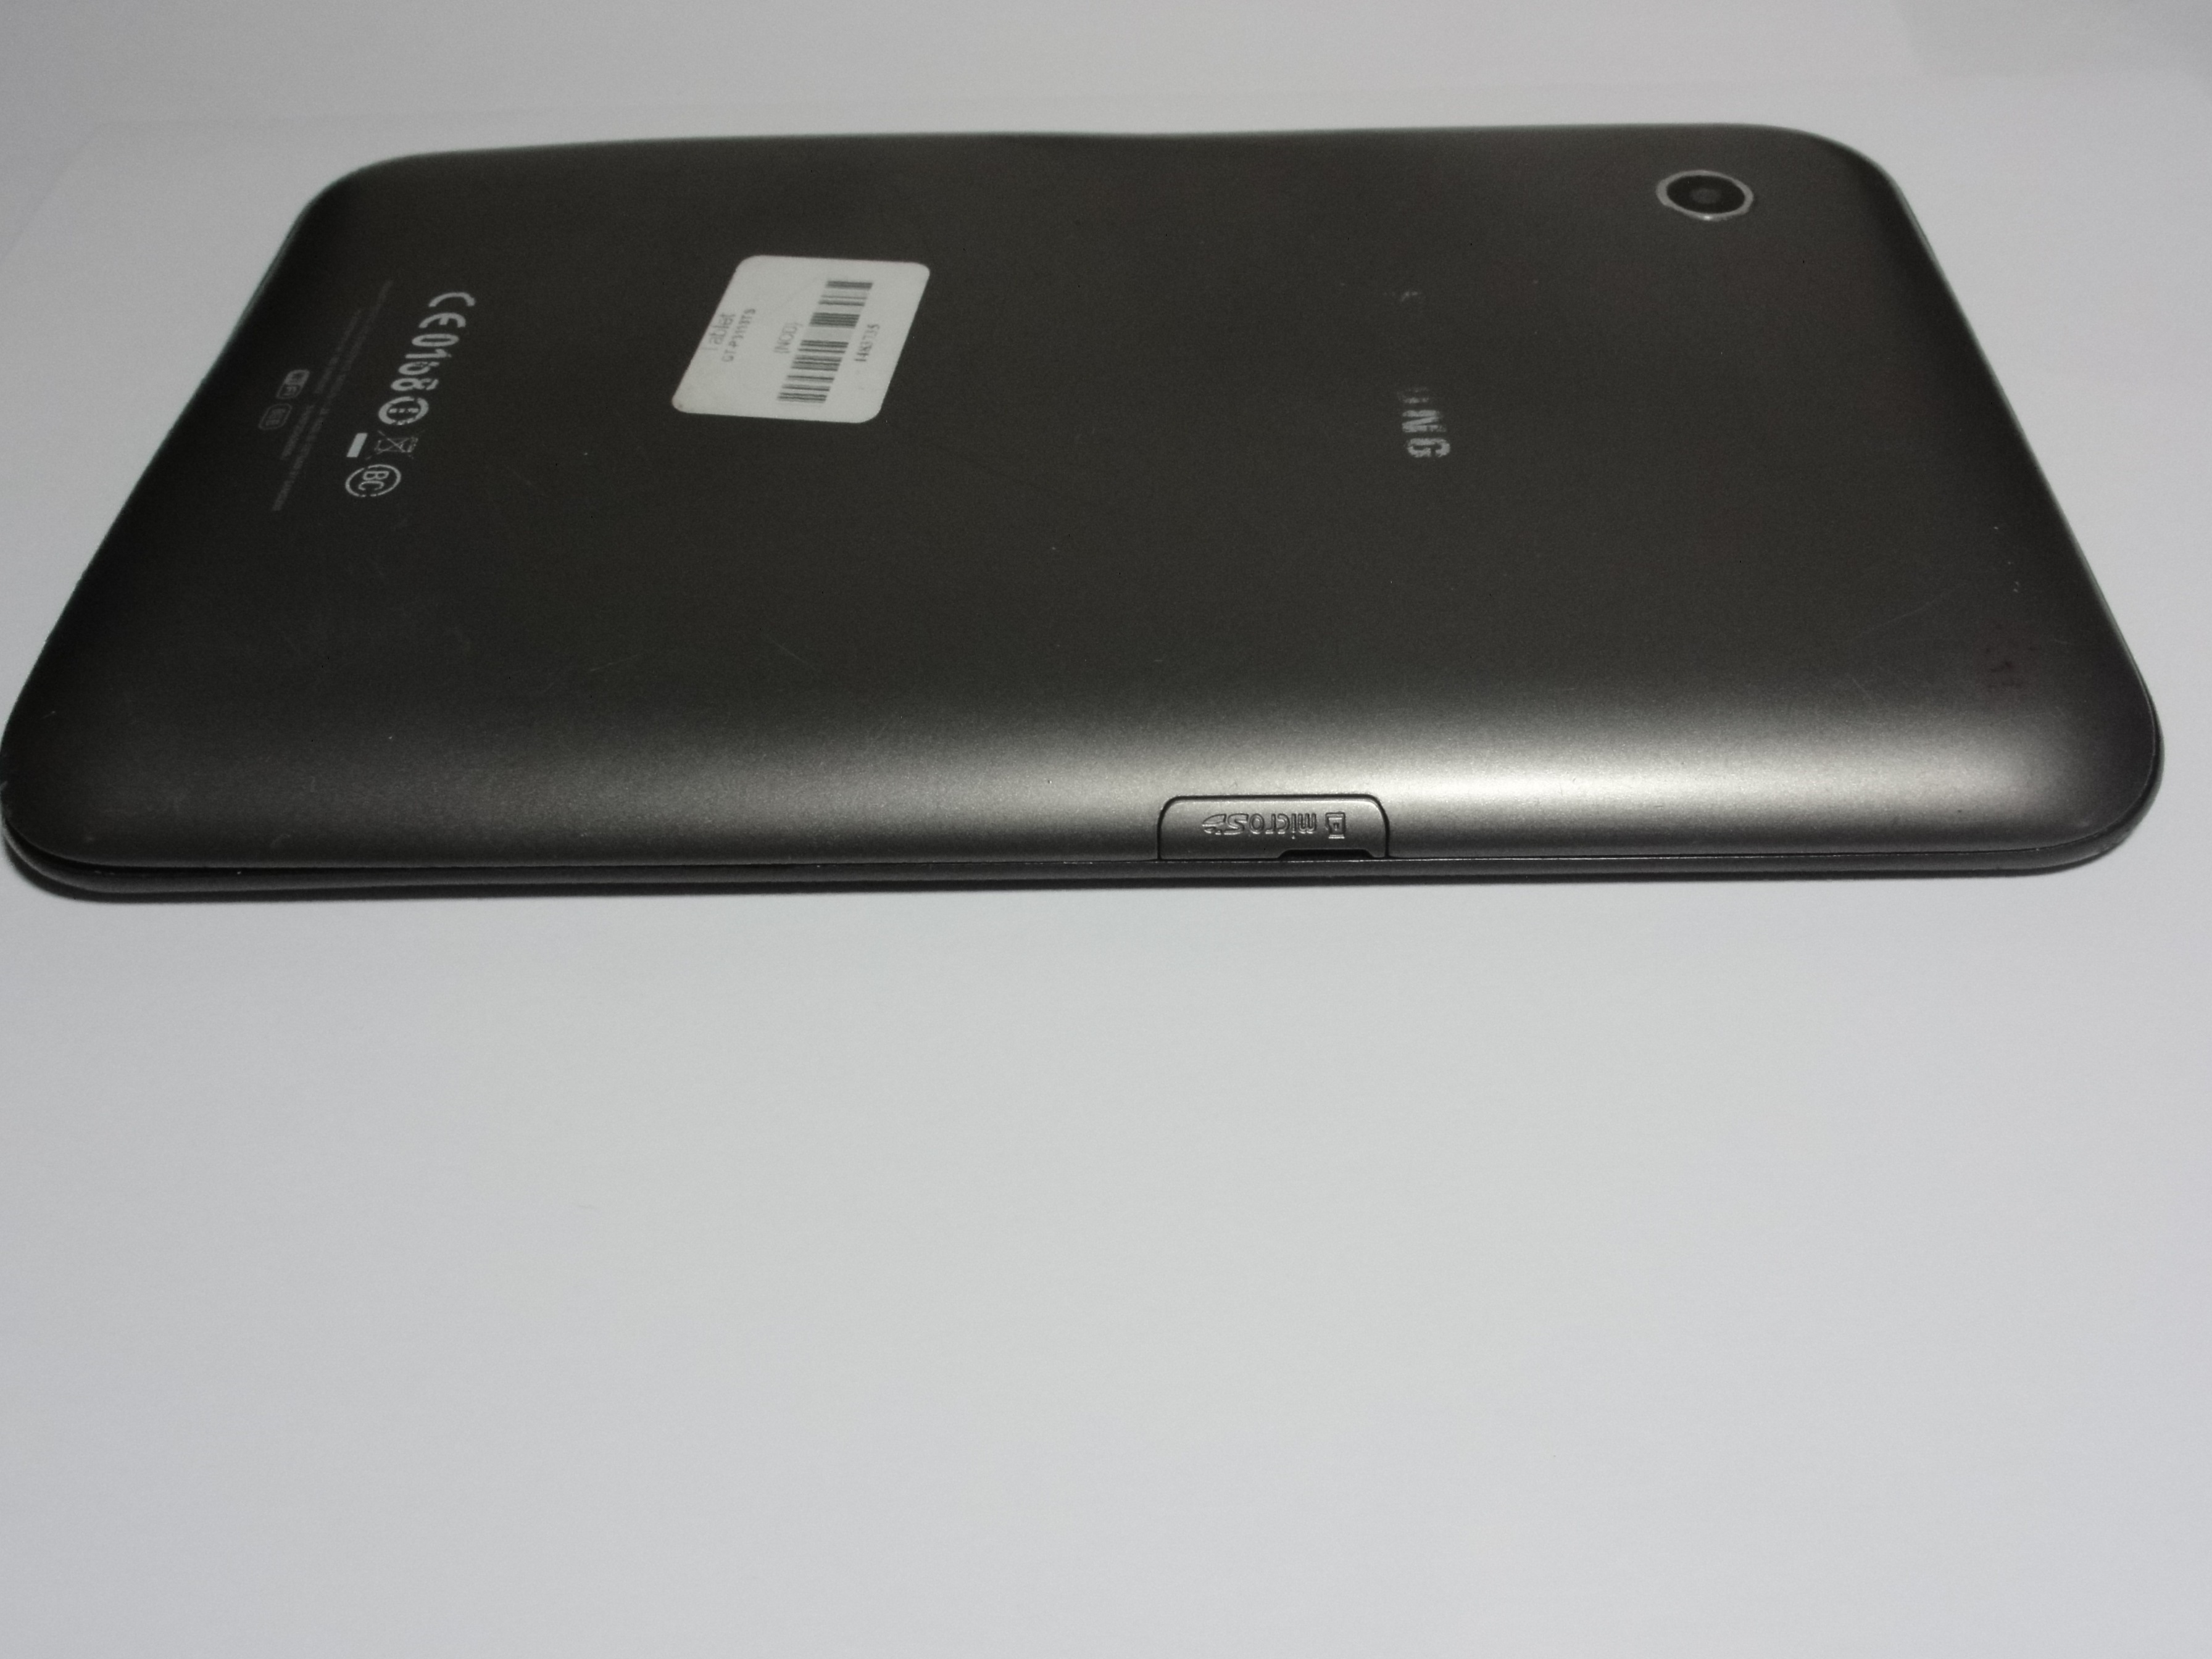 Samsung Galaxy Tab 2 70 Repair Ifixit Kabel Data 1 Original 100 Battery